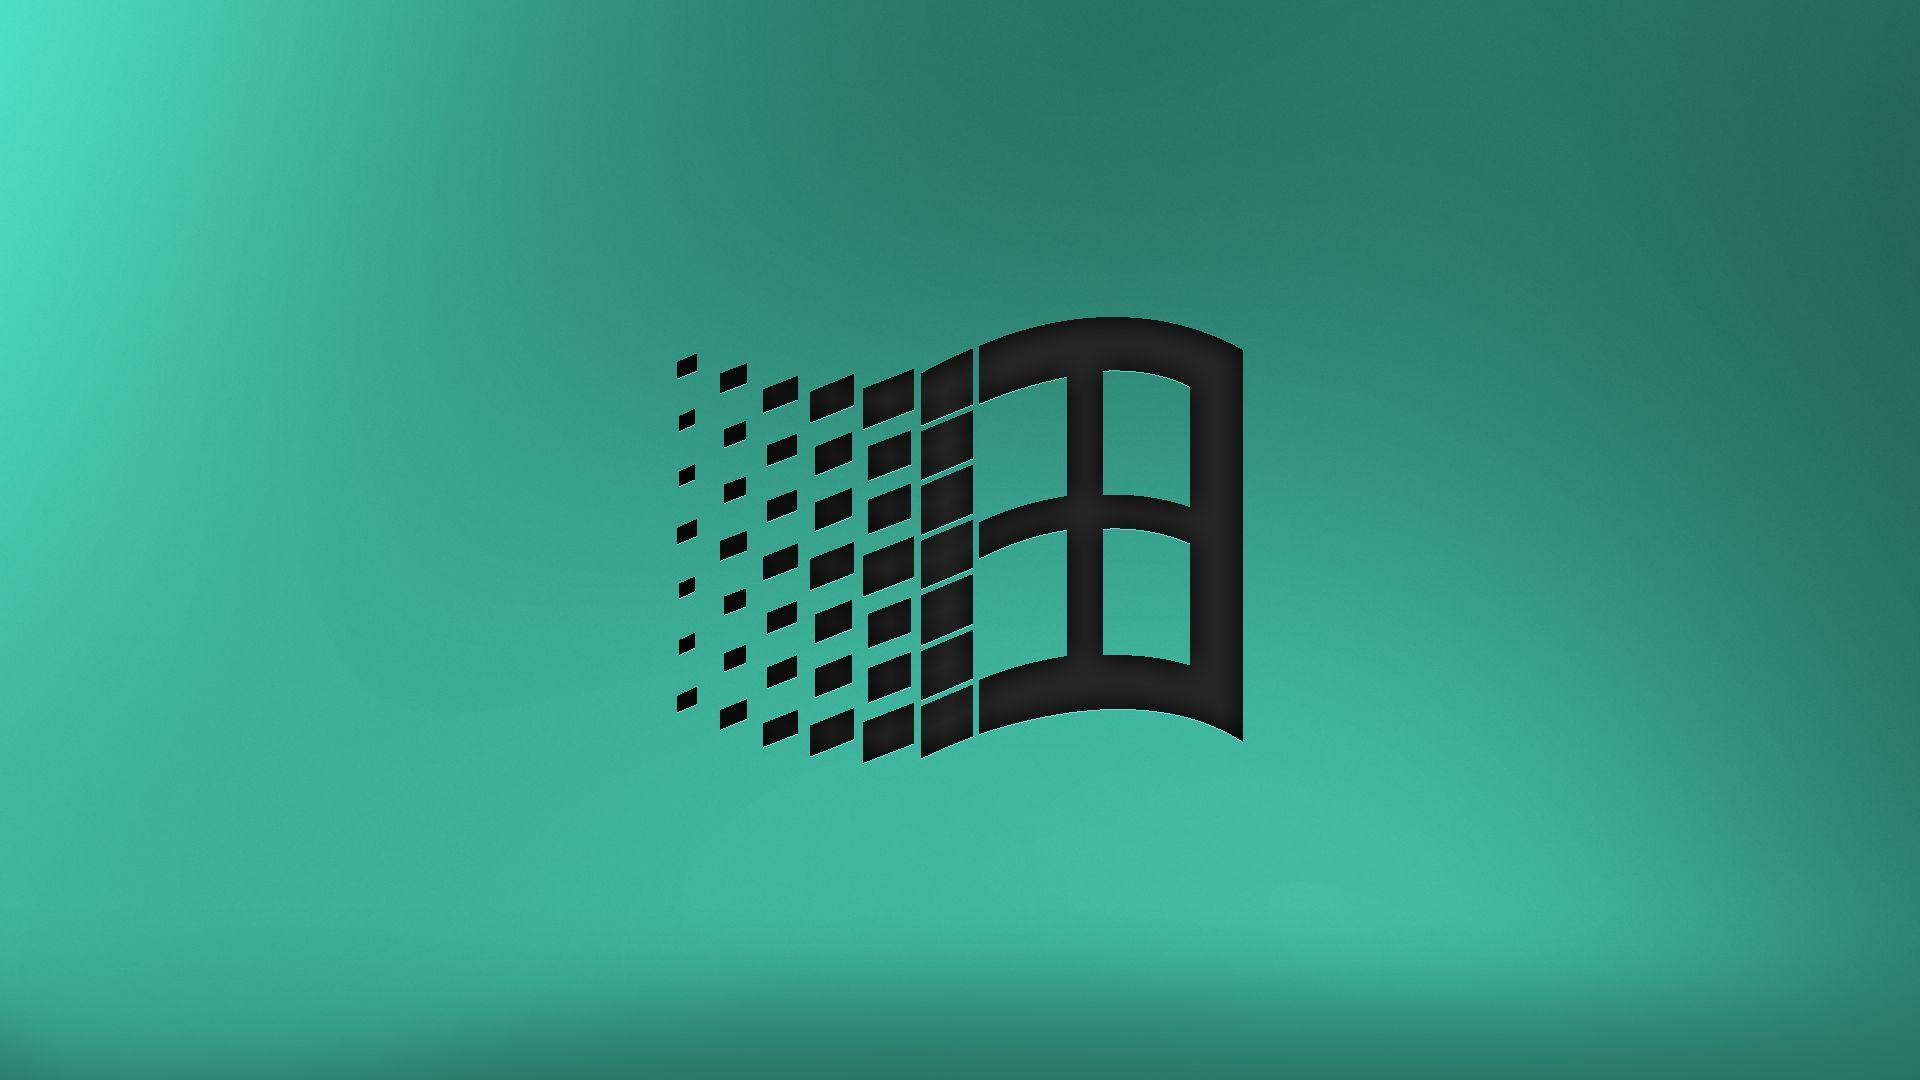 Windows wallpaper photo full hd